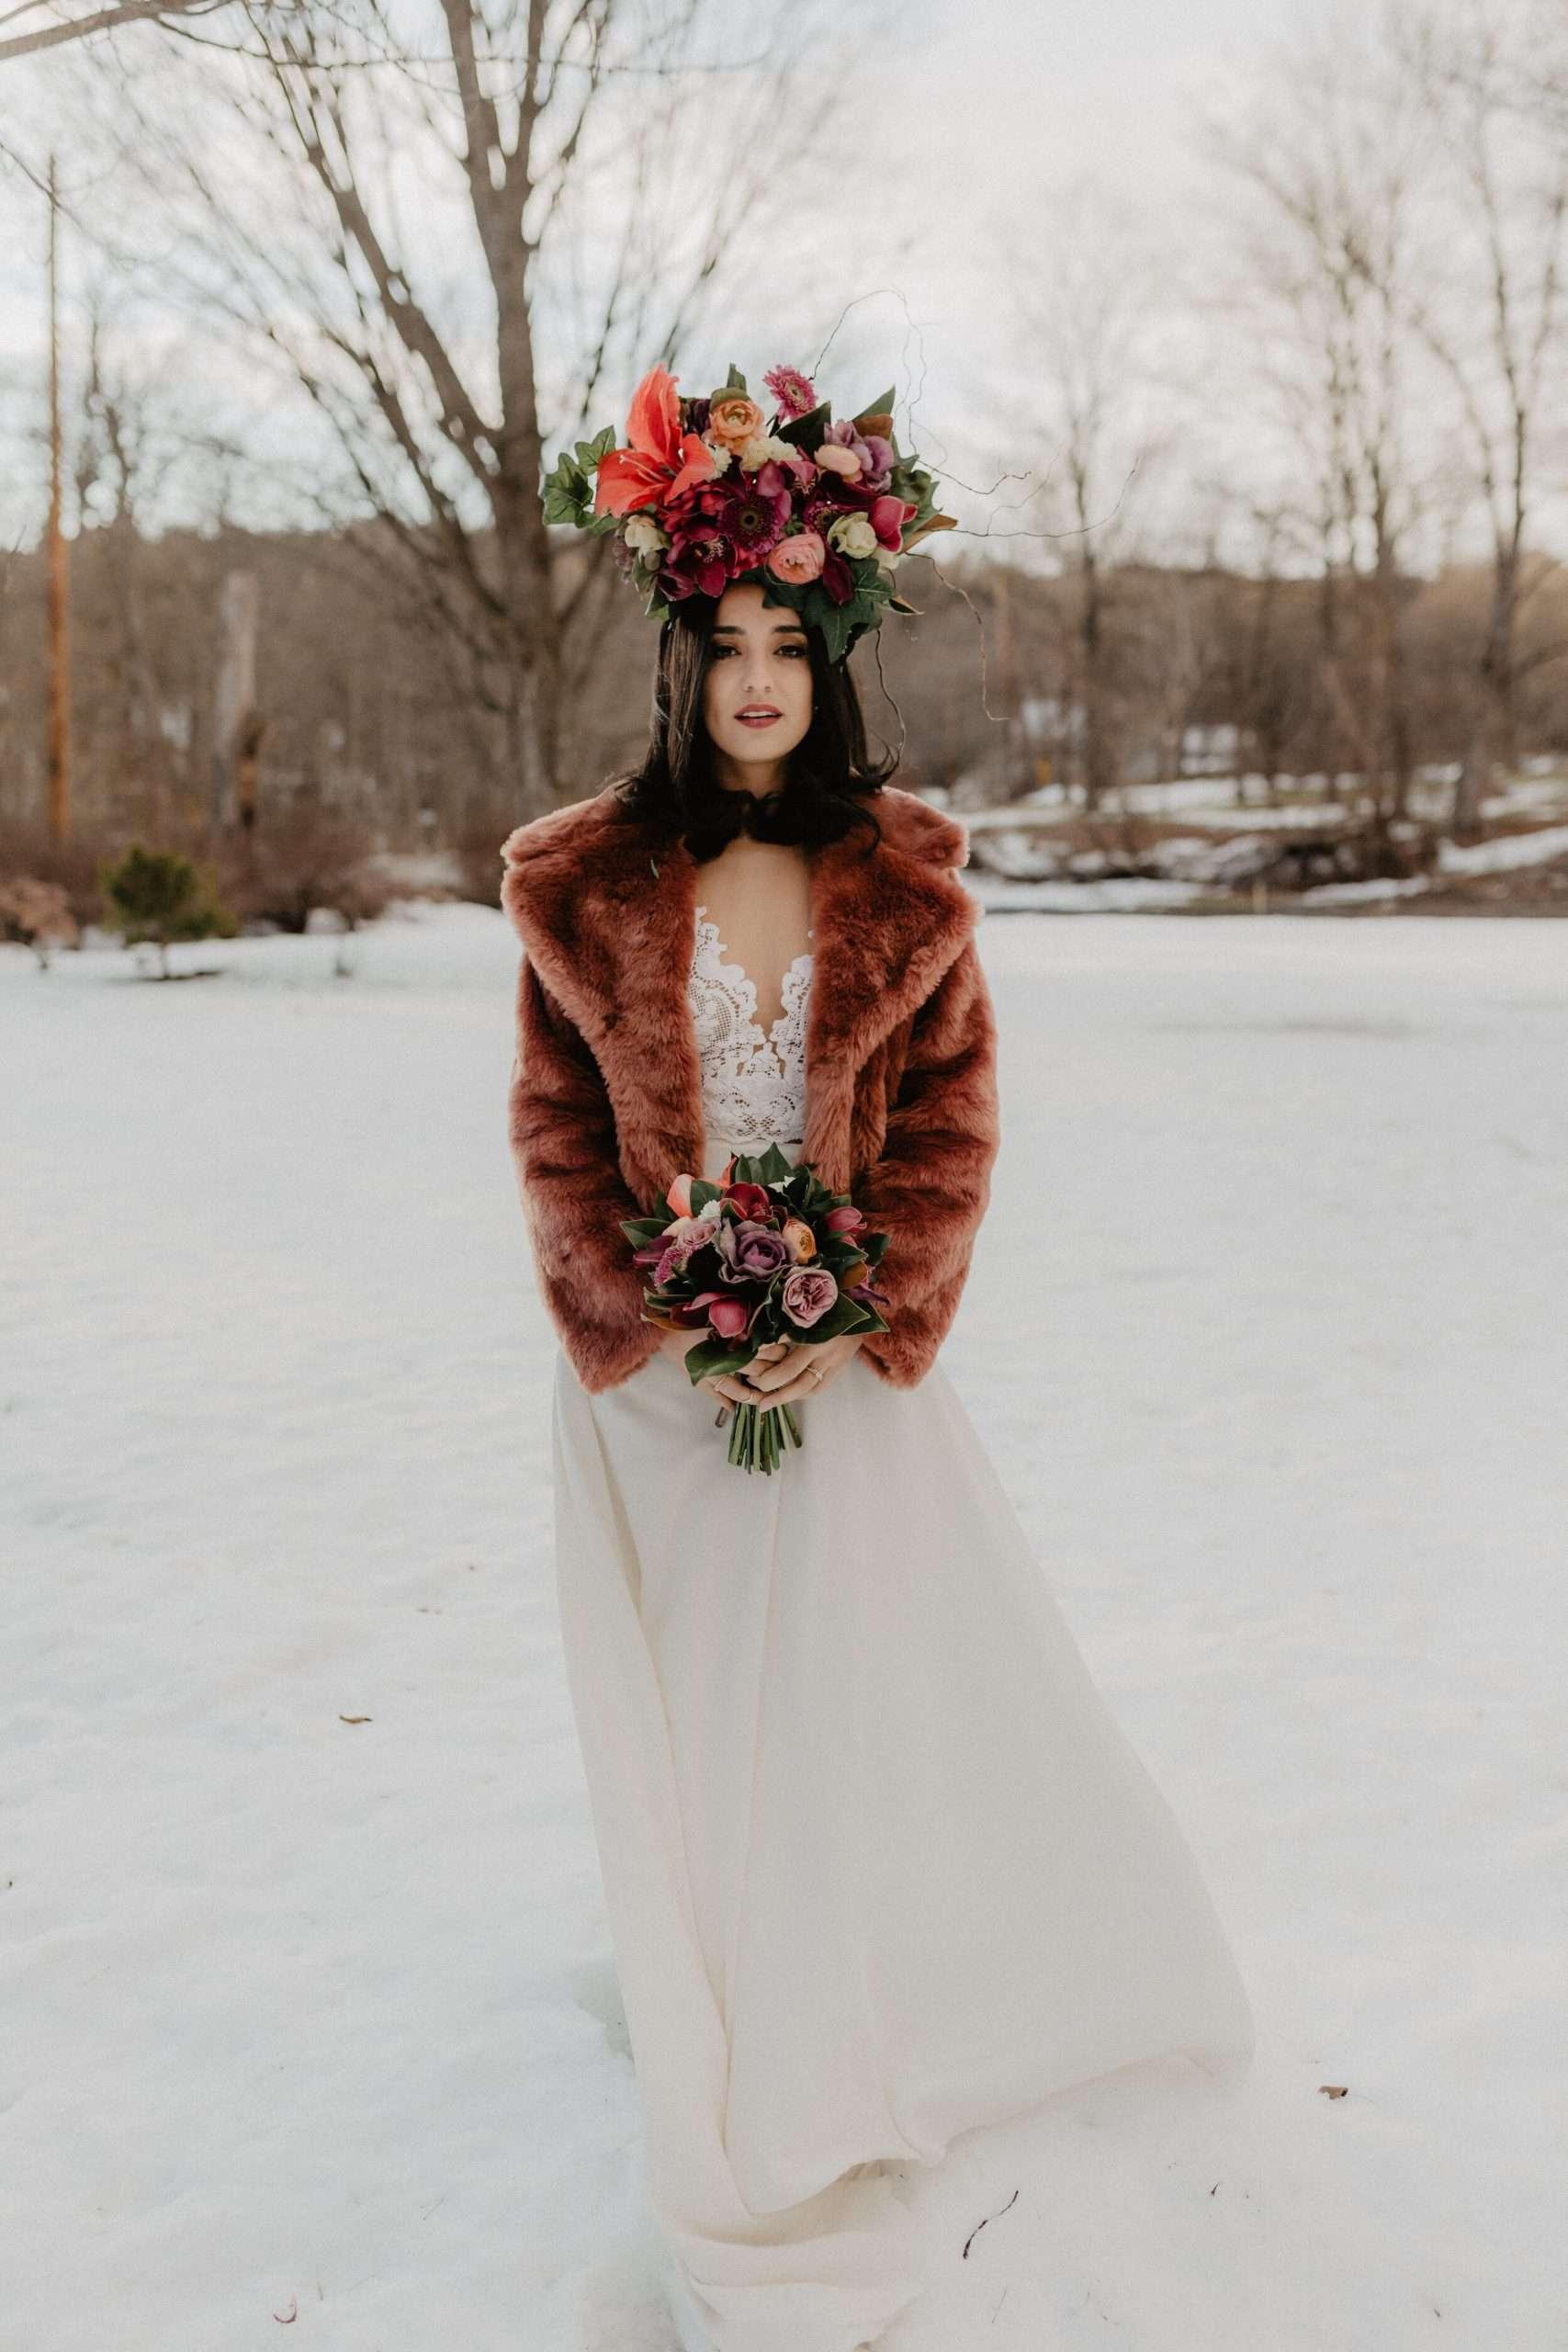 winter bride in wedding gown in snow